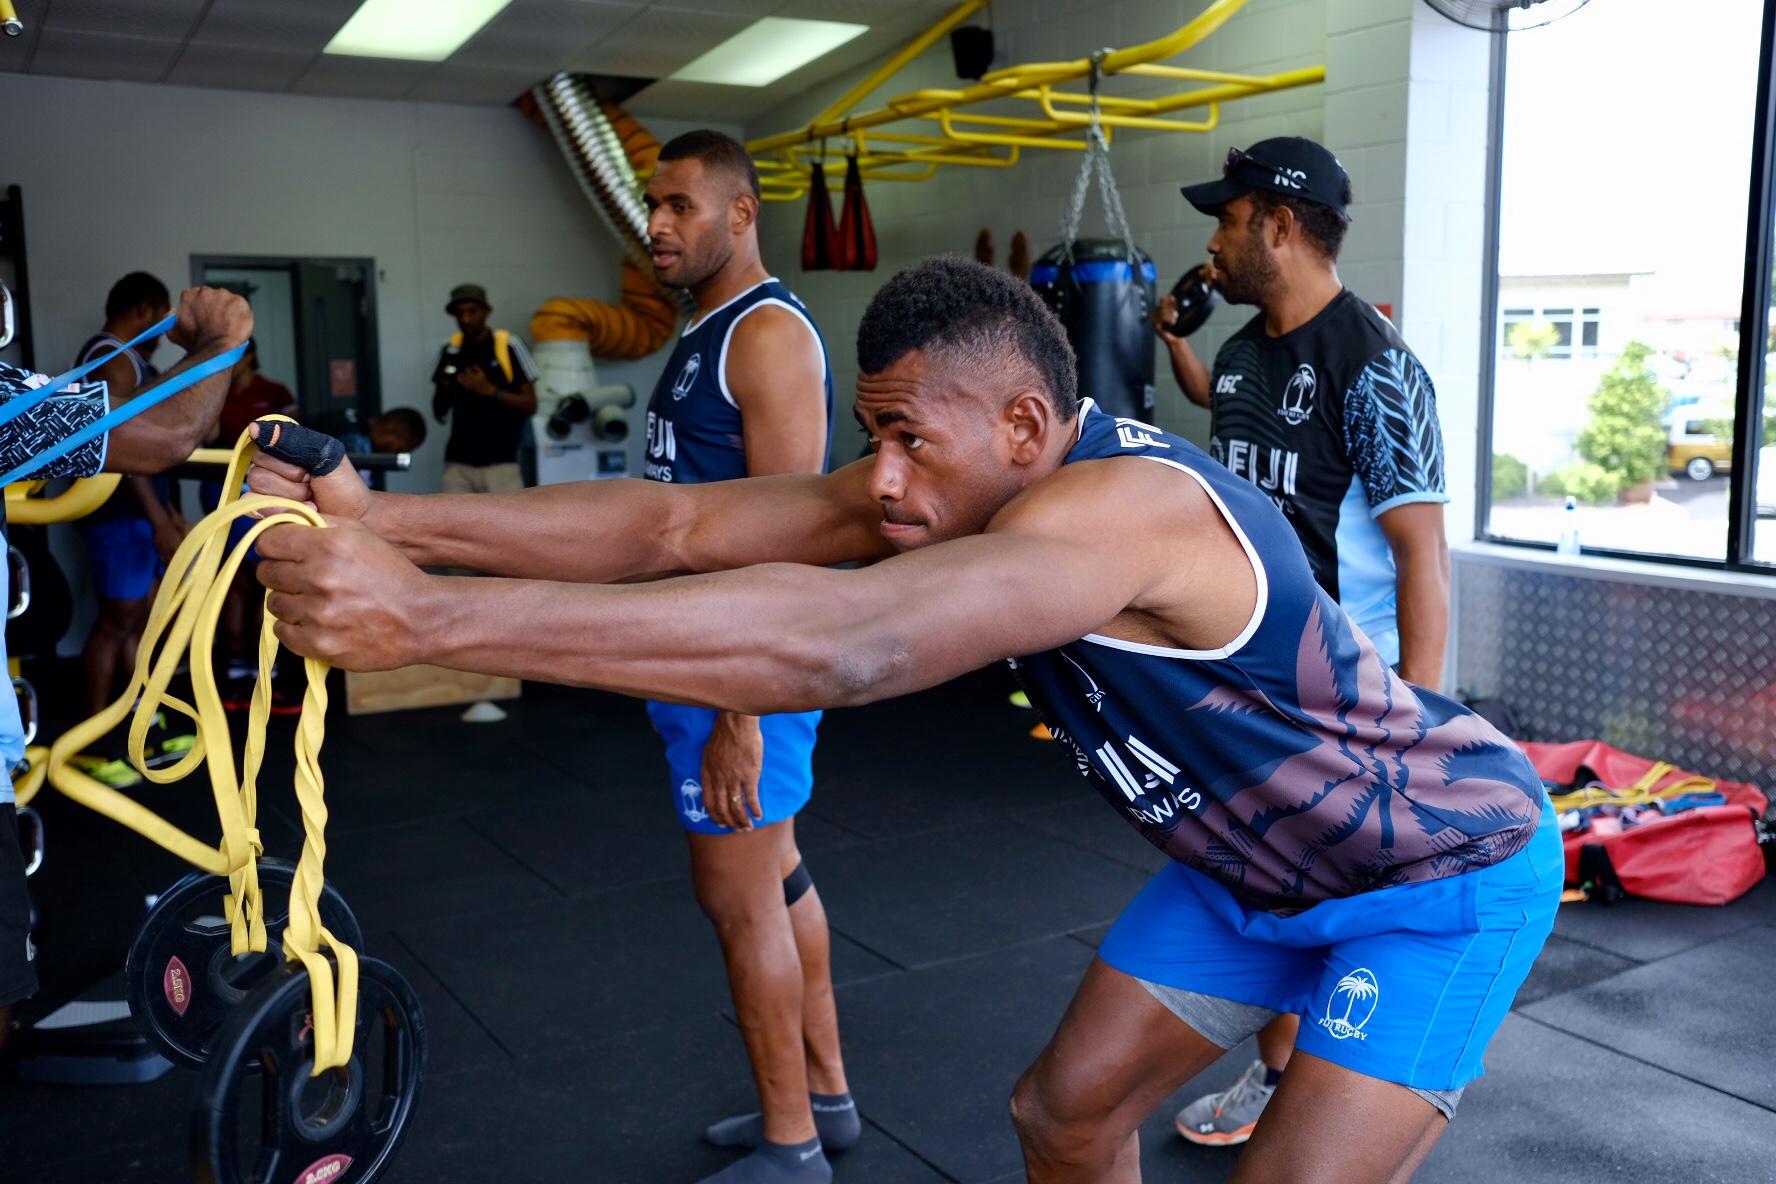 Fiji Airways Fijian 7s rep Sevuloni Mocenacagi trains in a gym in Hamilton on January 31, 2018.  Photo:  Bruce Southwick/zoomfiji.